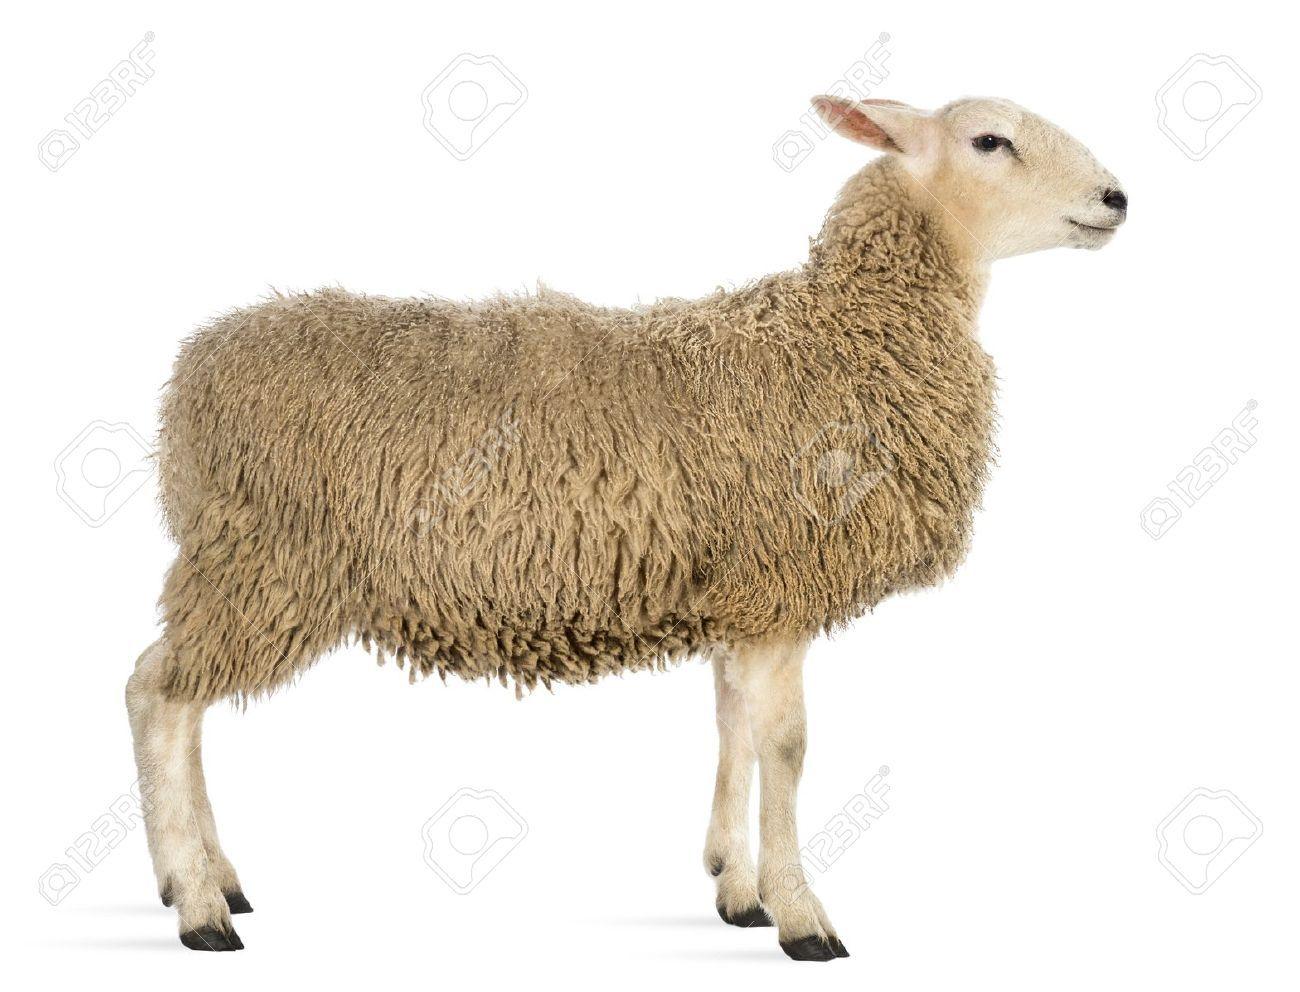 lamb anatomy - Google Search | All about Lambs | Pinterest